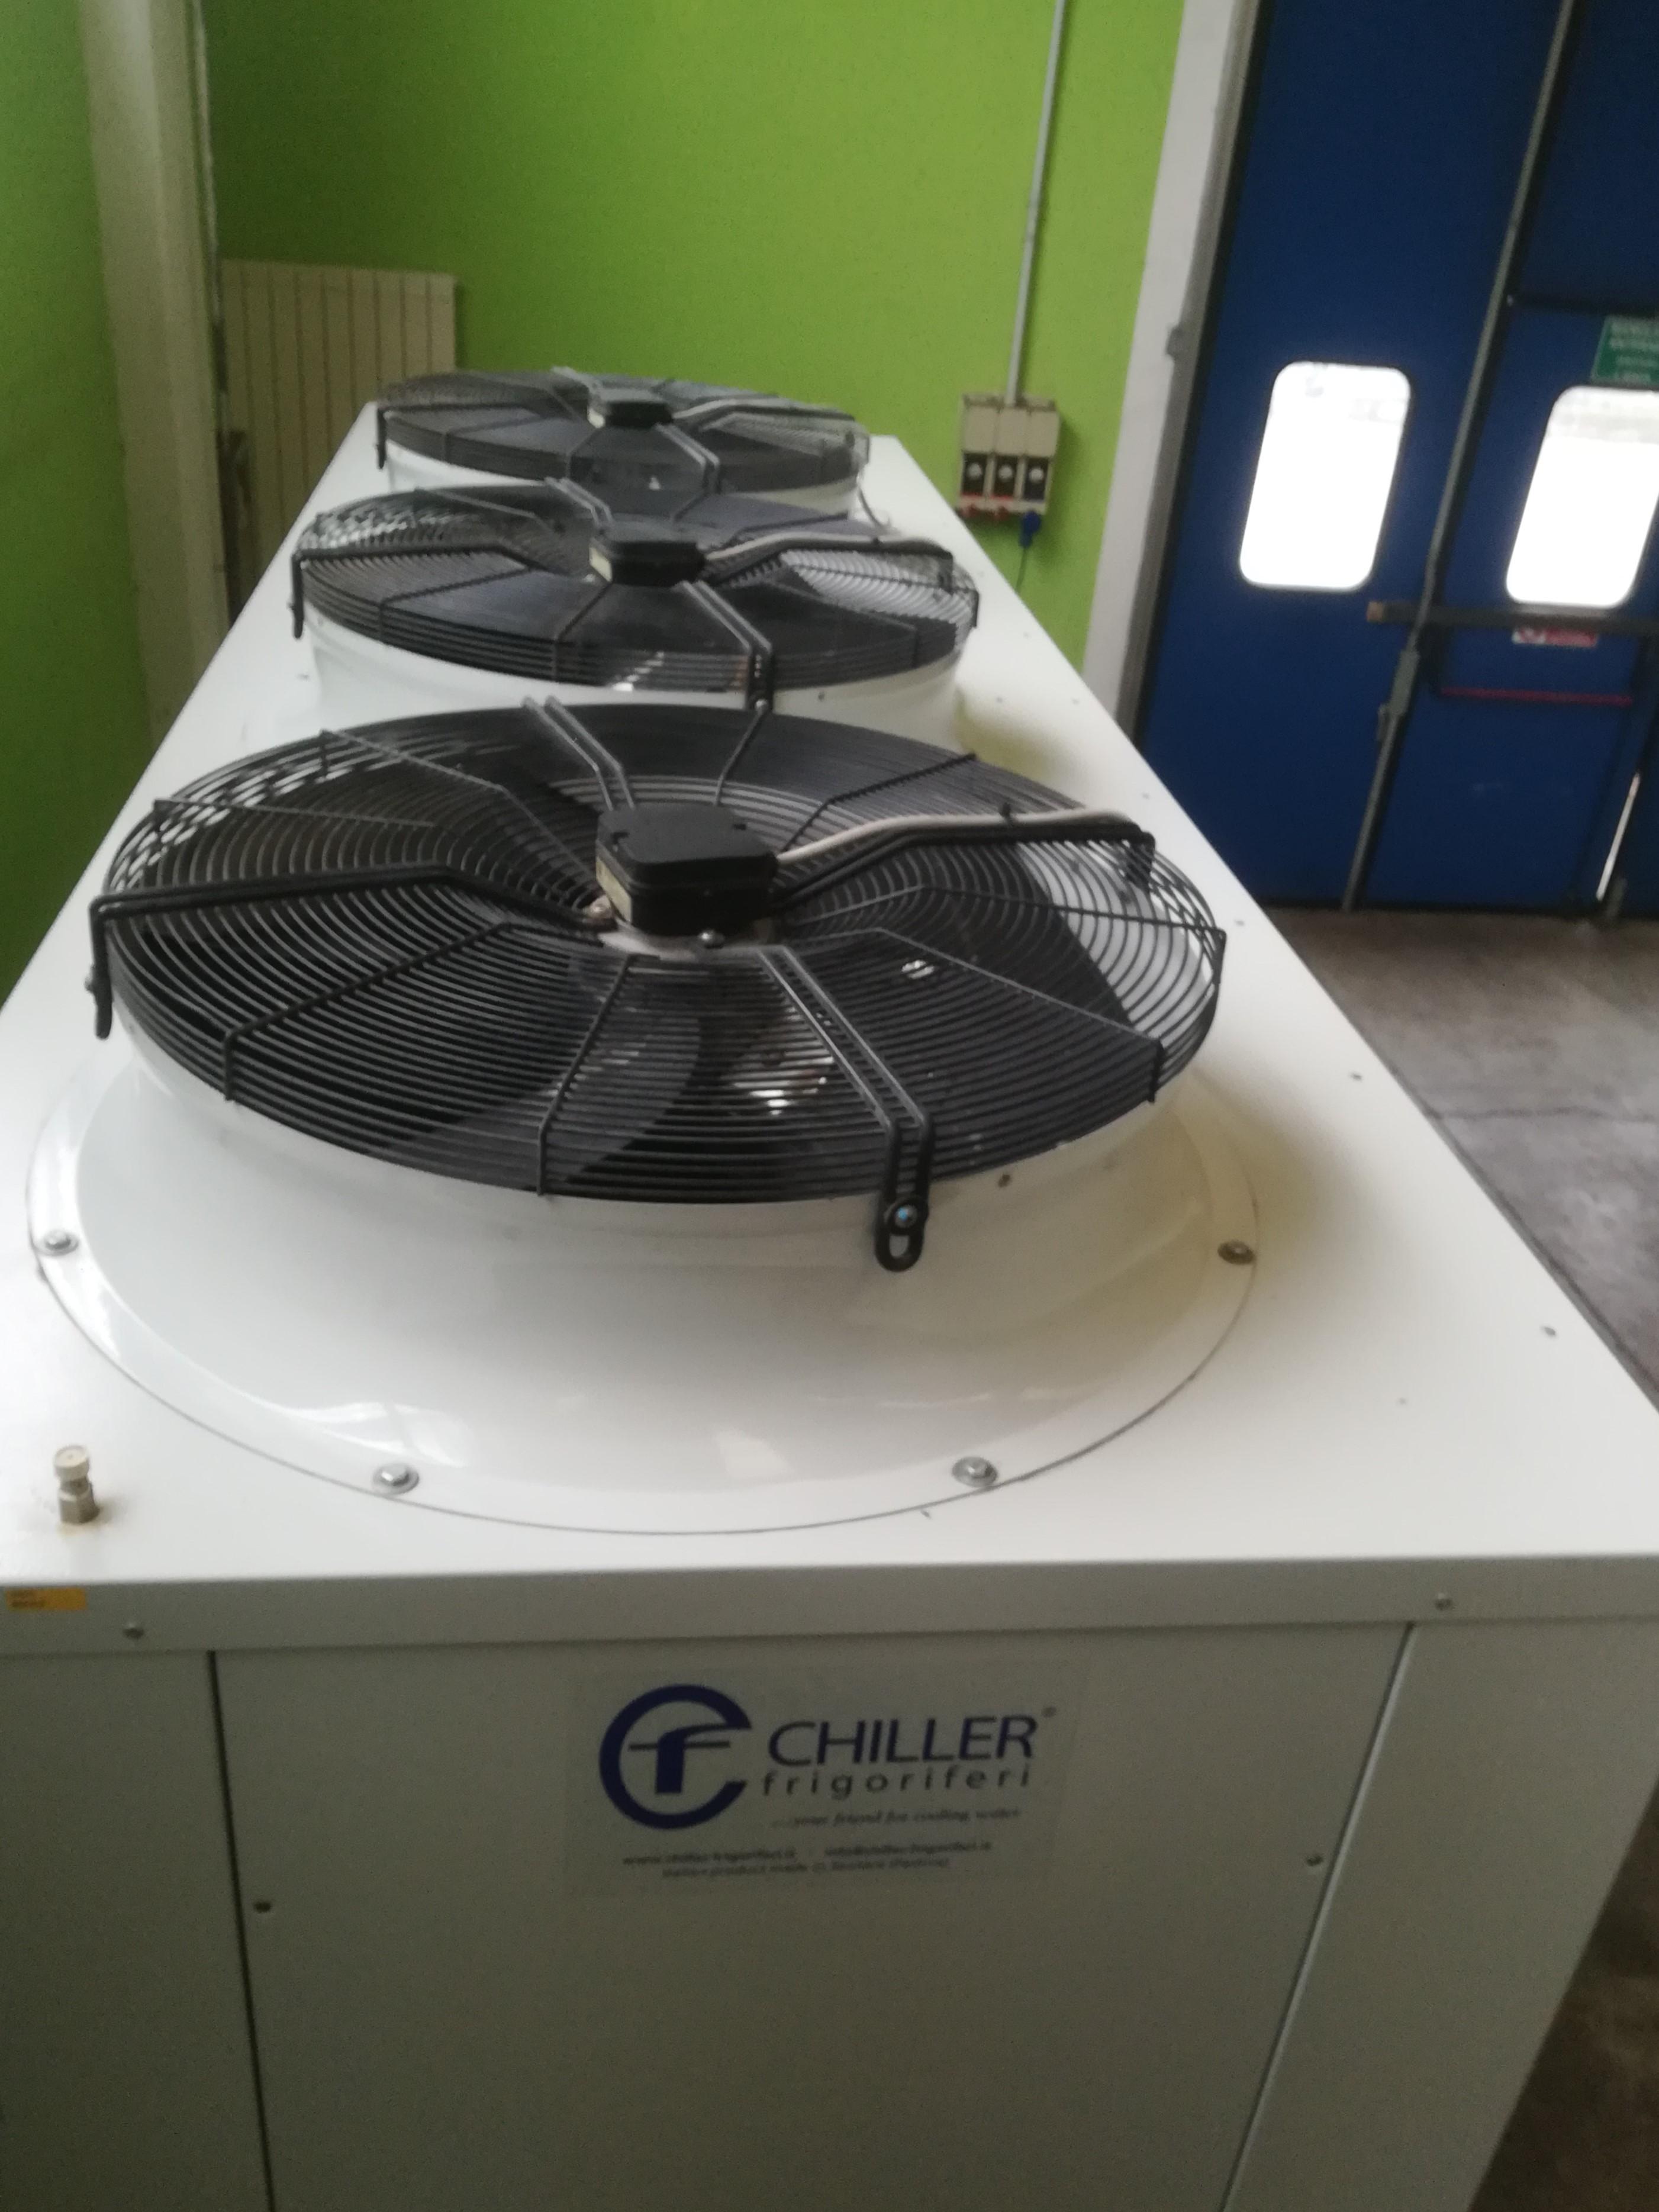 Chiller Frigoriferi CFA S P-B ST 110.2 MB in vendita - foto 5